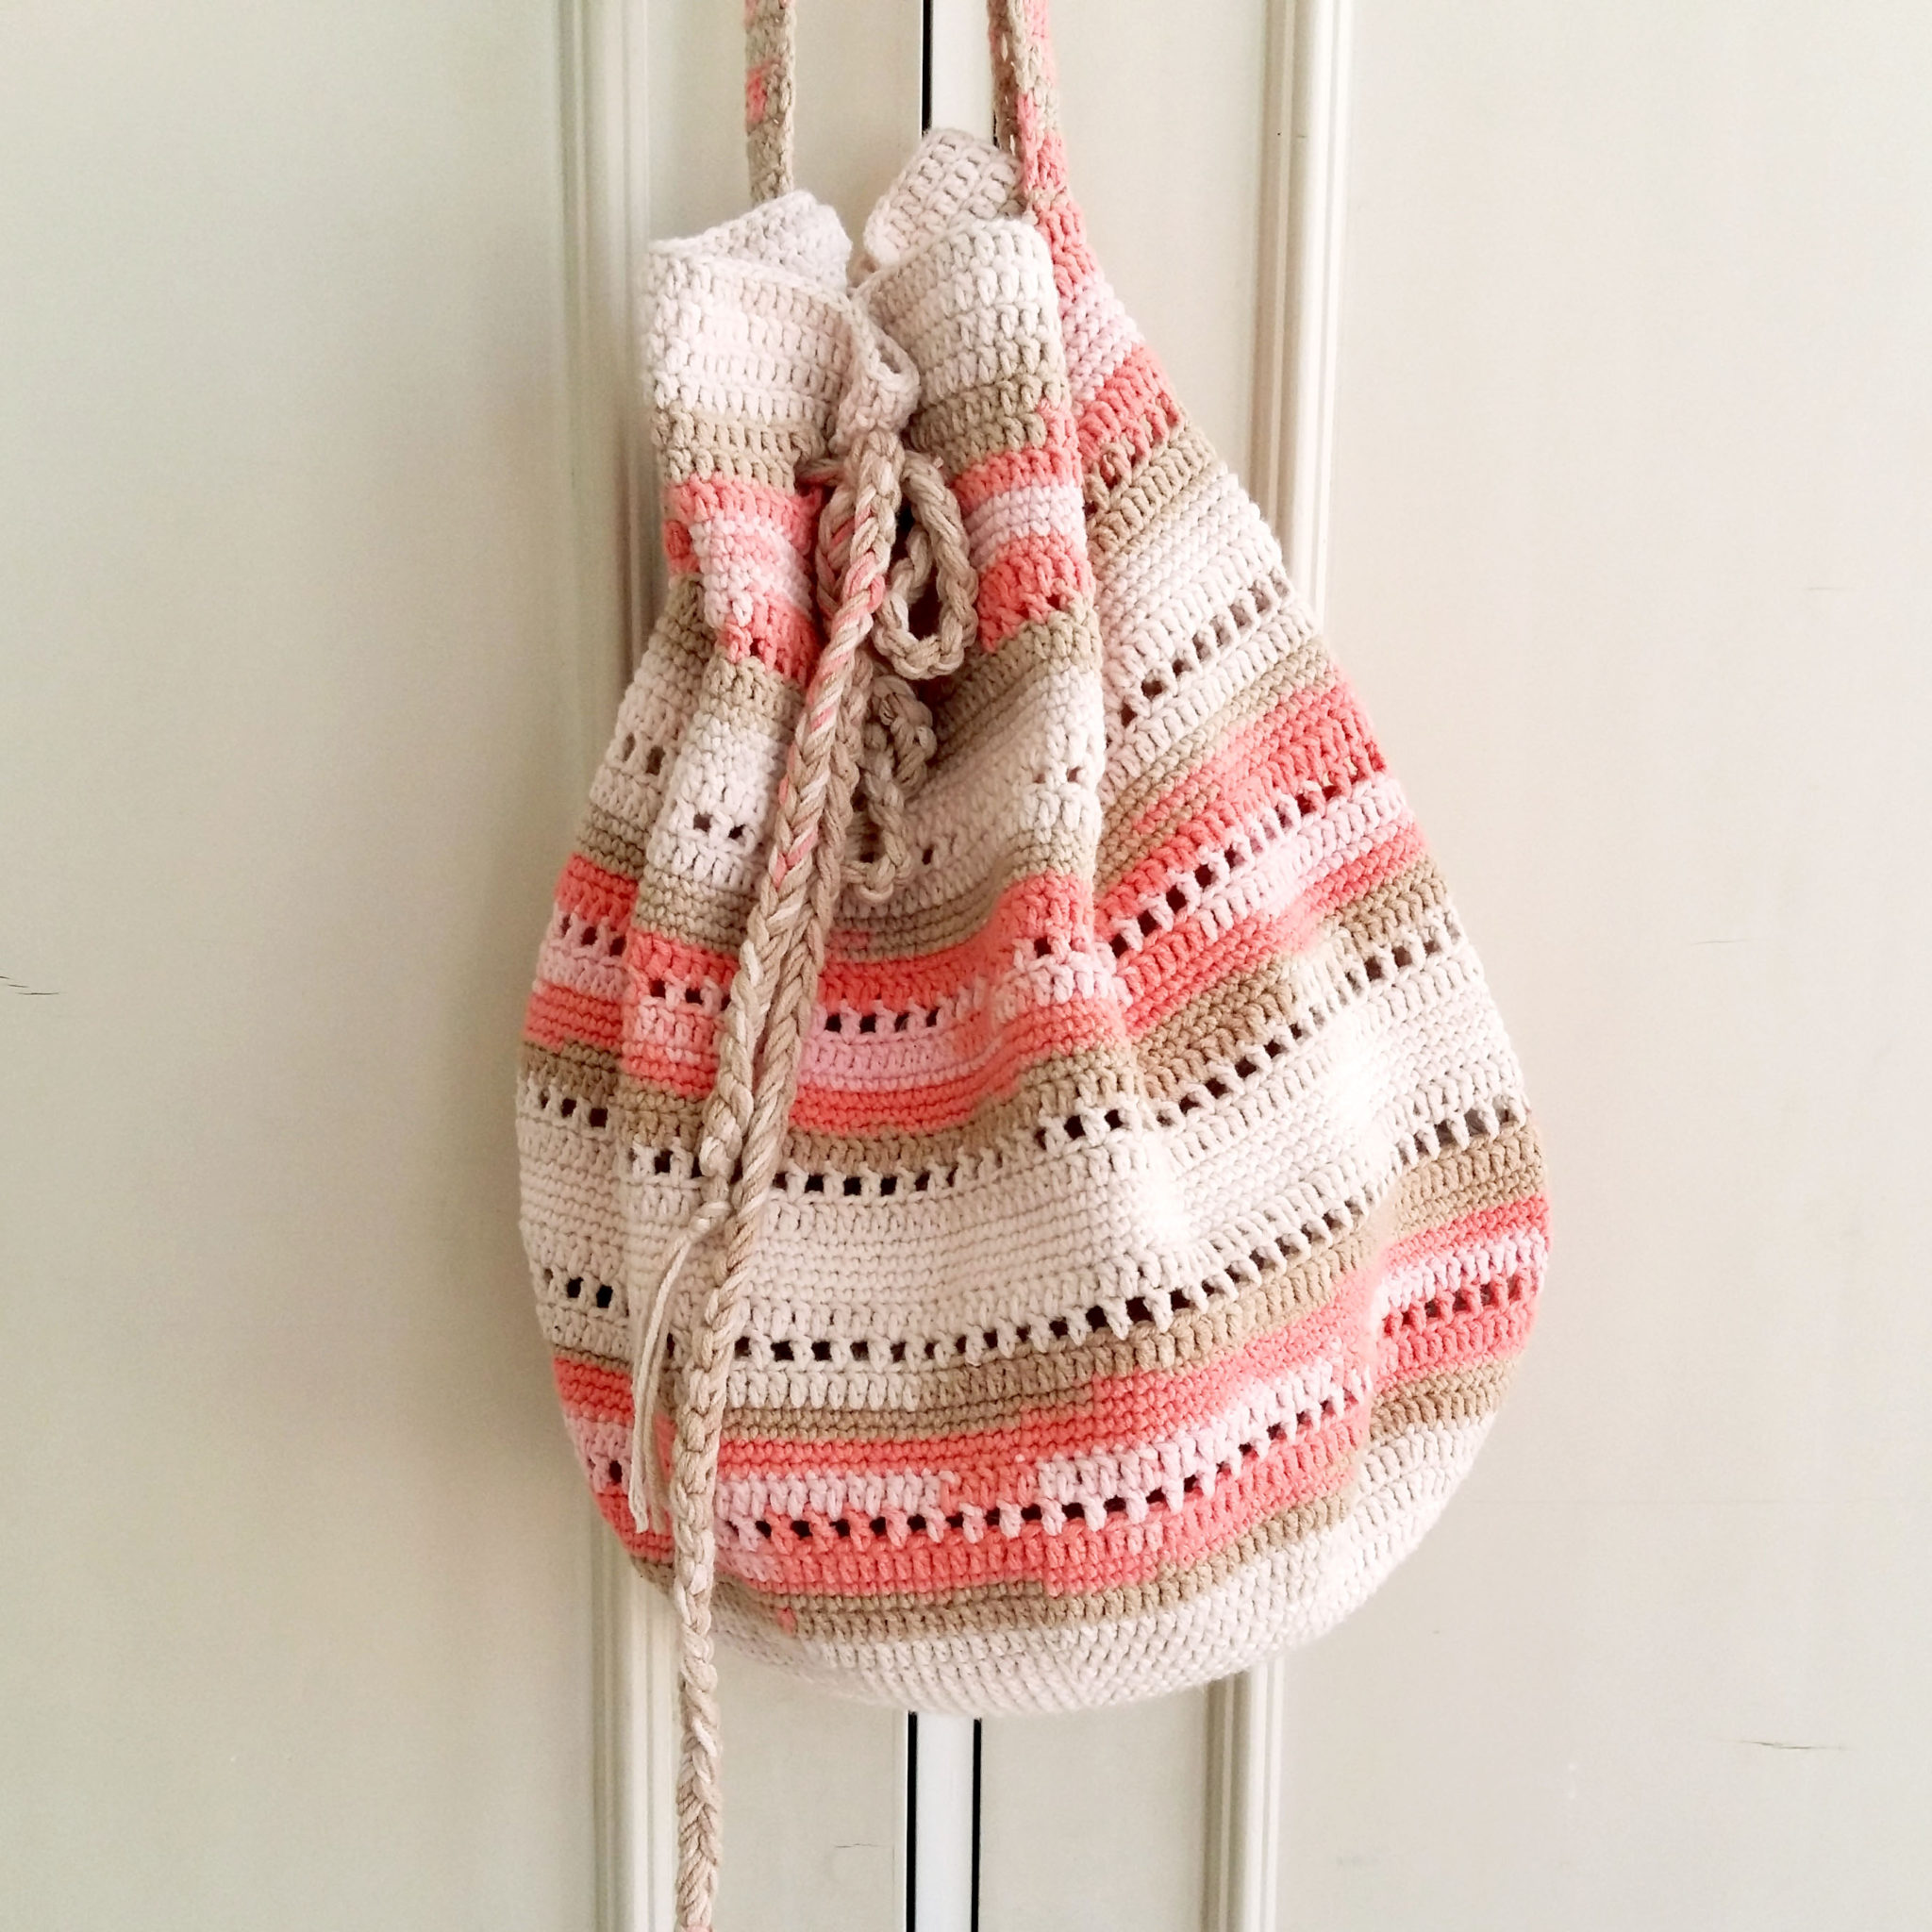 Cotton Crochet Patterns Best Decorating Ideas